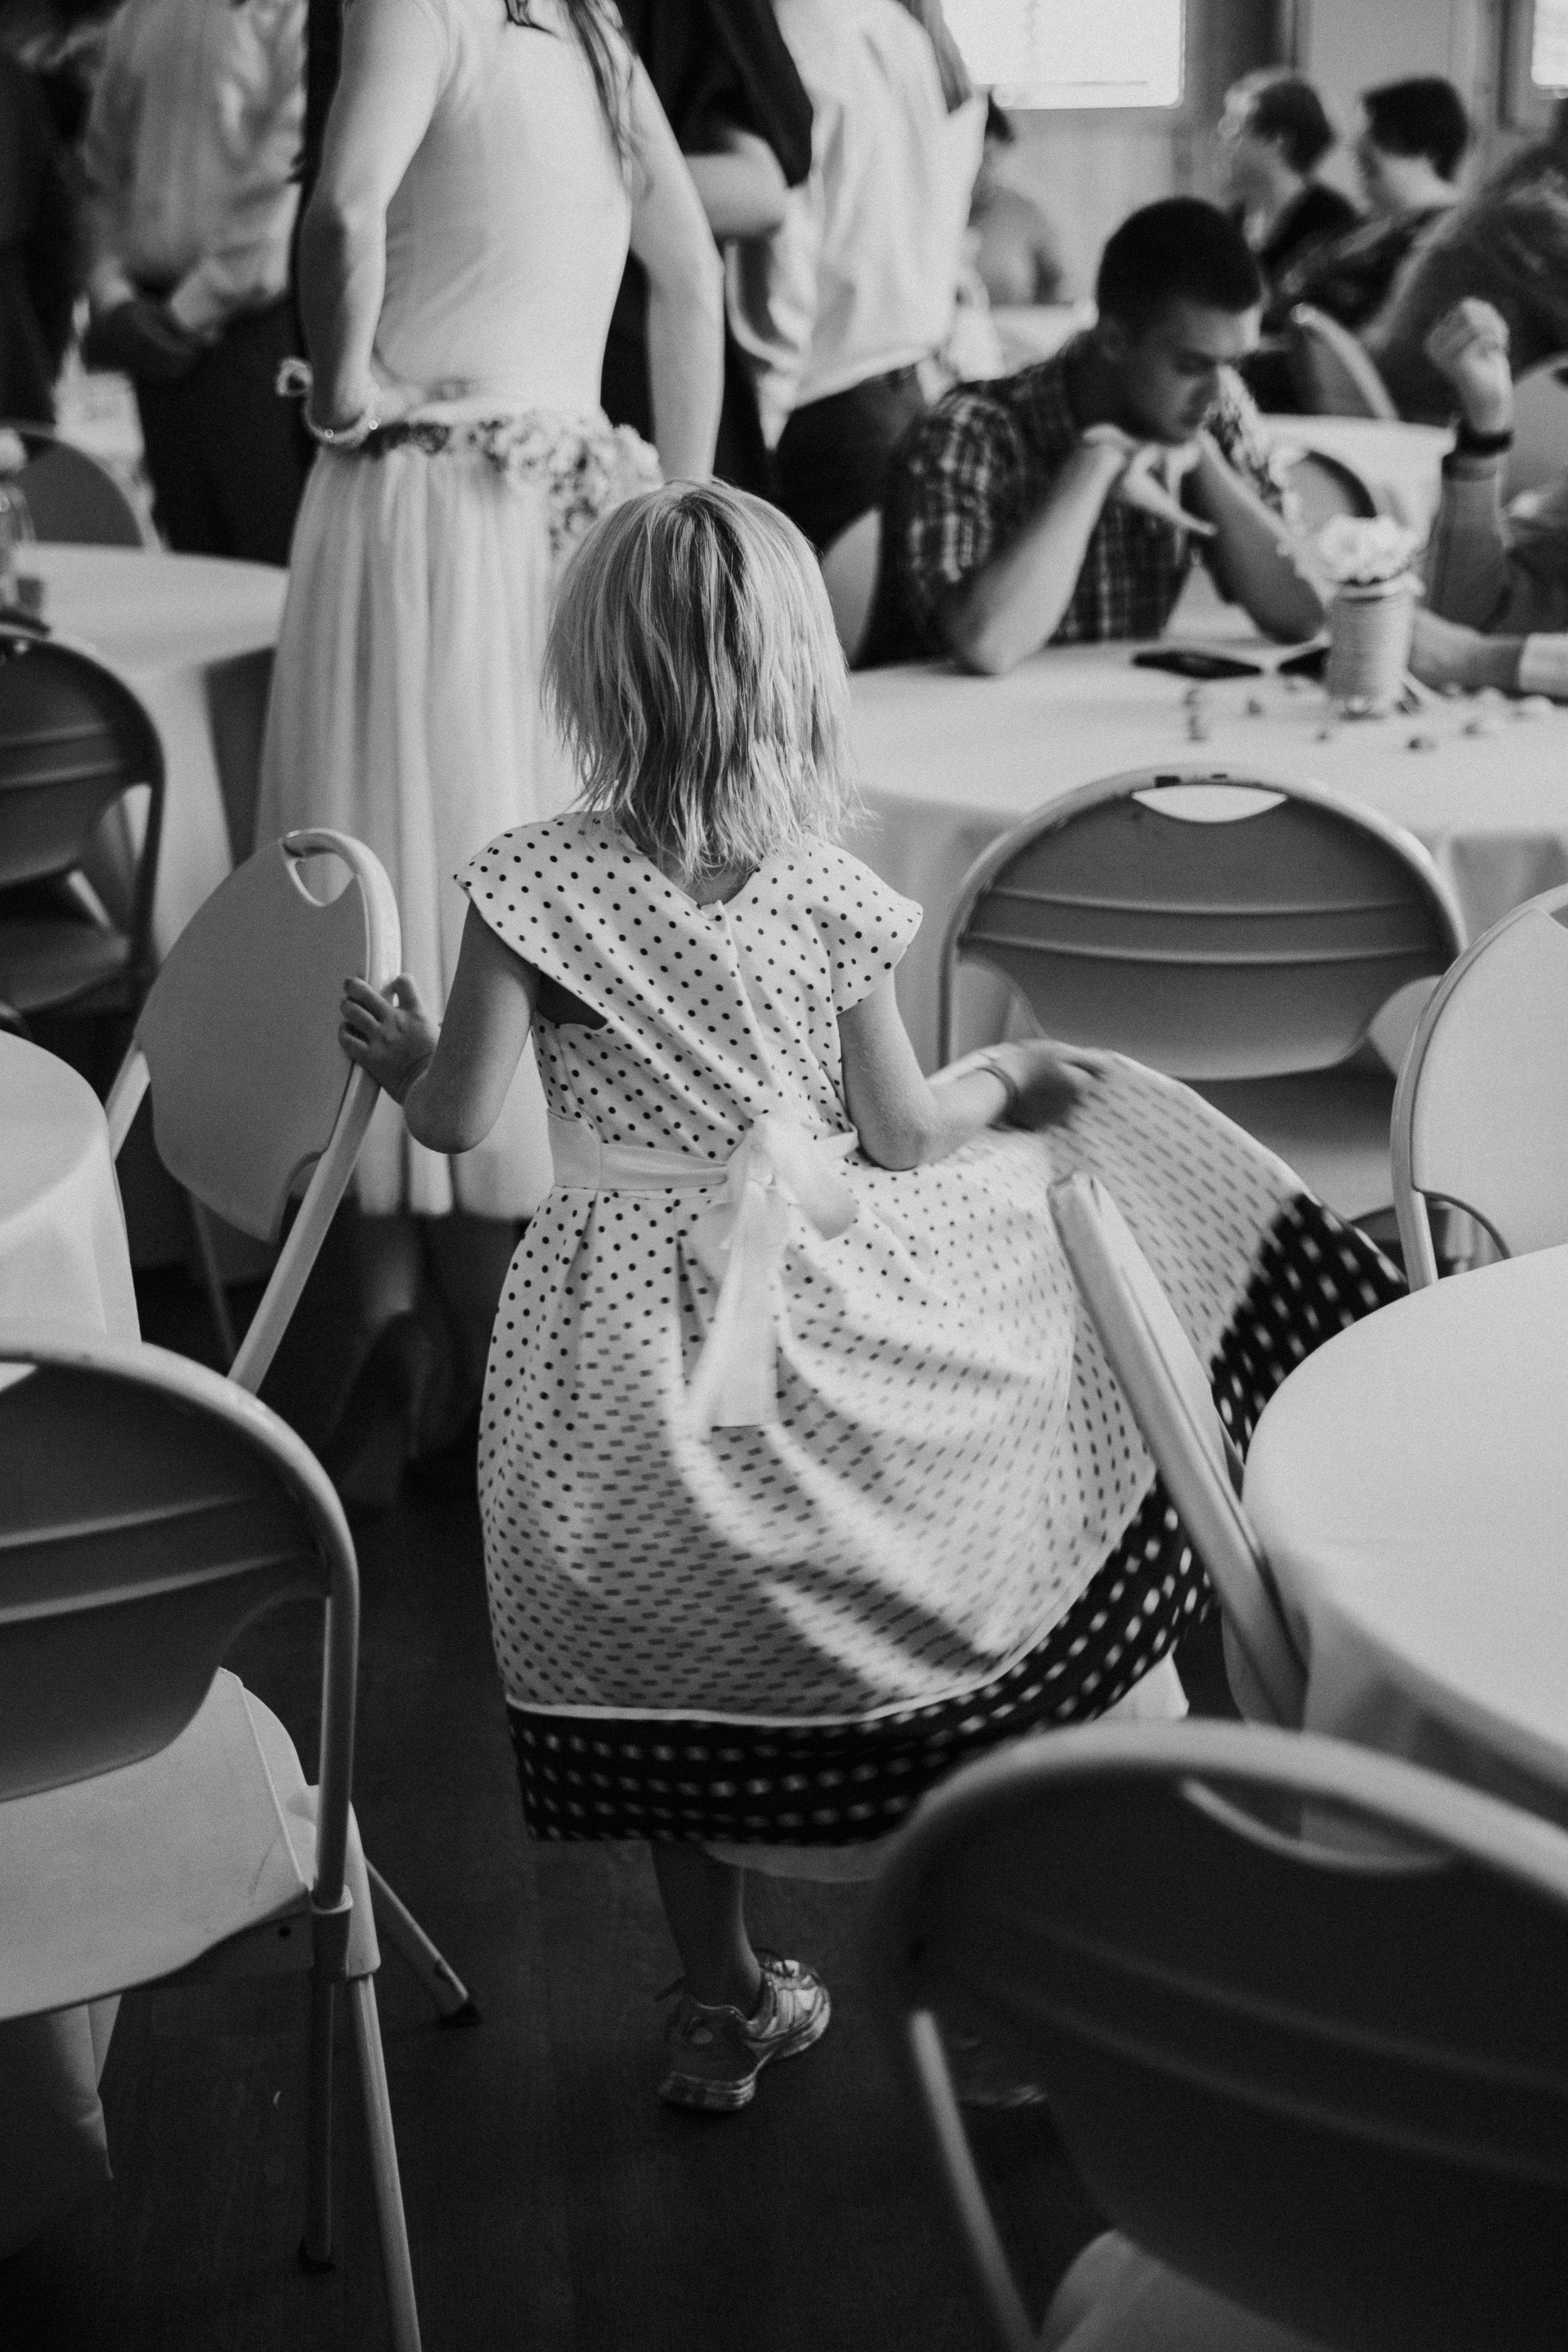 Jilian + Dakota - Wedding - Wedding Photographer - Utah Wedding Photographer - Las Vegas Wedding Photographer - Seattle Wedding Photographer - Lifestyle Photographer - Wedding Photojournalist - Cedar City Wedding Photographer - Tan Suit - Off White Wedding Dress - Pink and Baby's Breath - Baby's Breath Bouquet - Cedar Breaks - LXC - Tribe Archipelago Presets - Southern Utah University Mountain Center